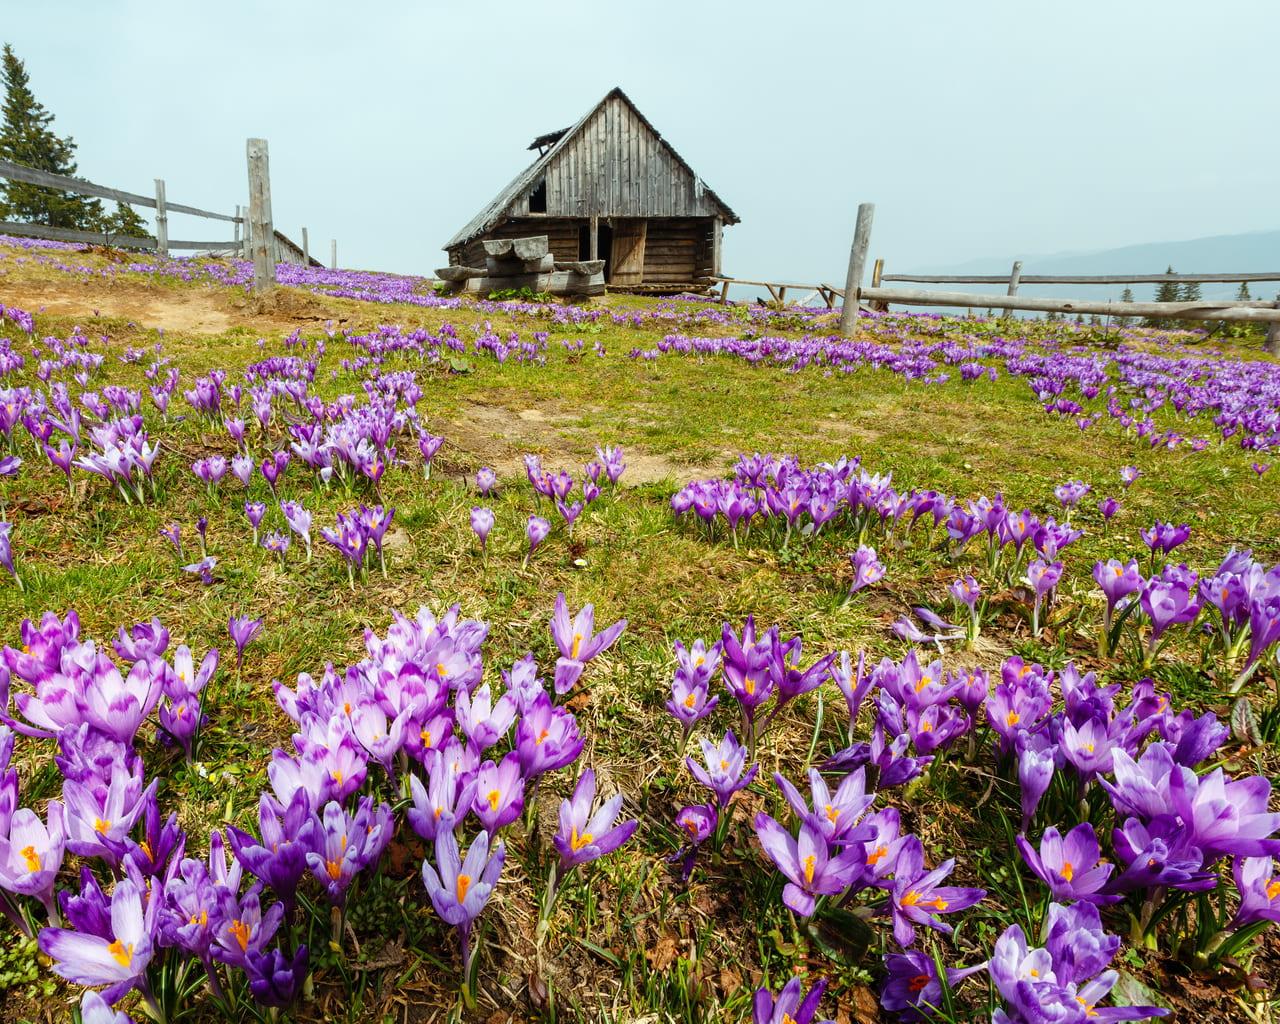 Gartenkrokus Crocus vernus in den Karpaten, Von Landscape Nature Photo Lizenzfreie Stockfotonummer: 1076272793